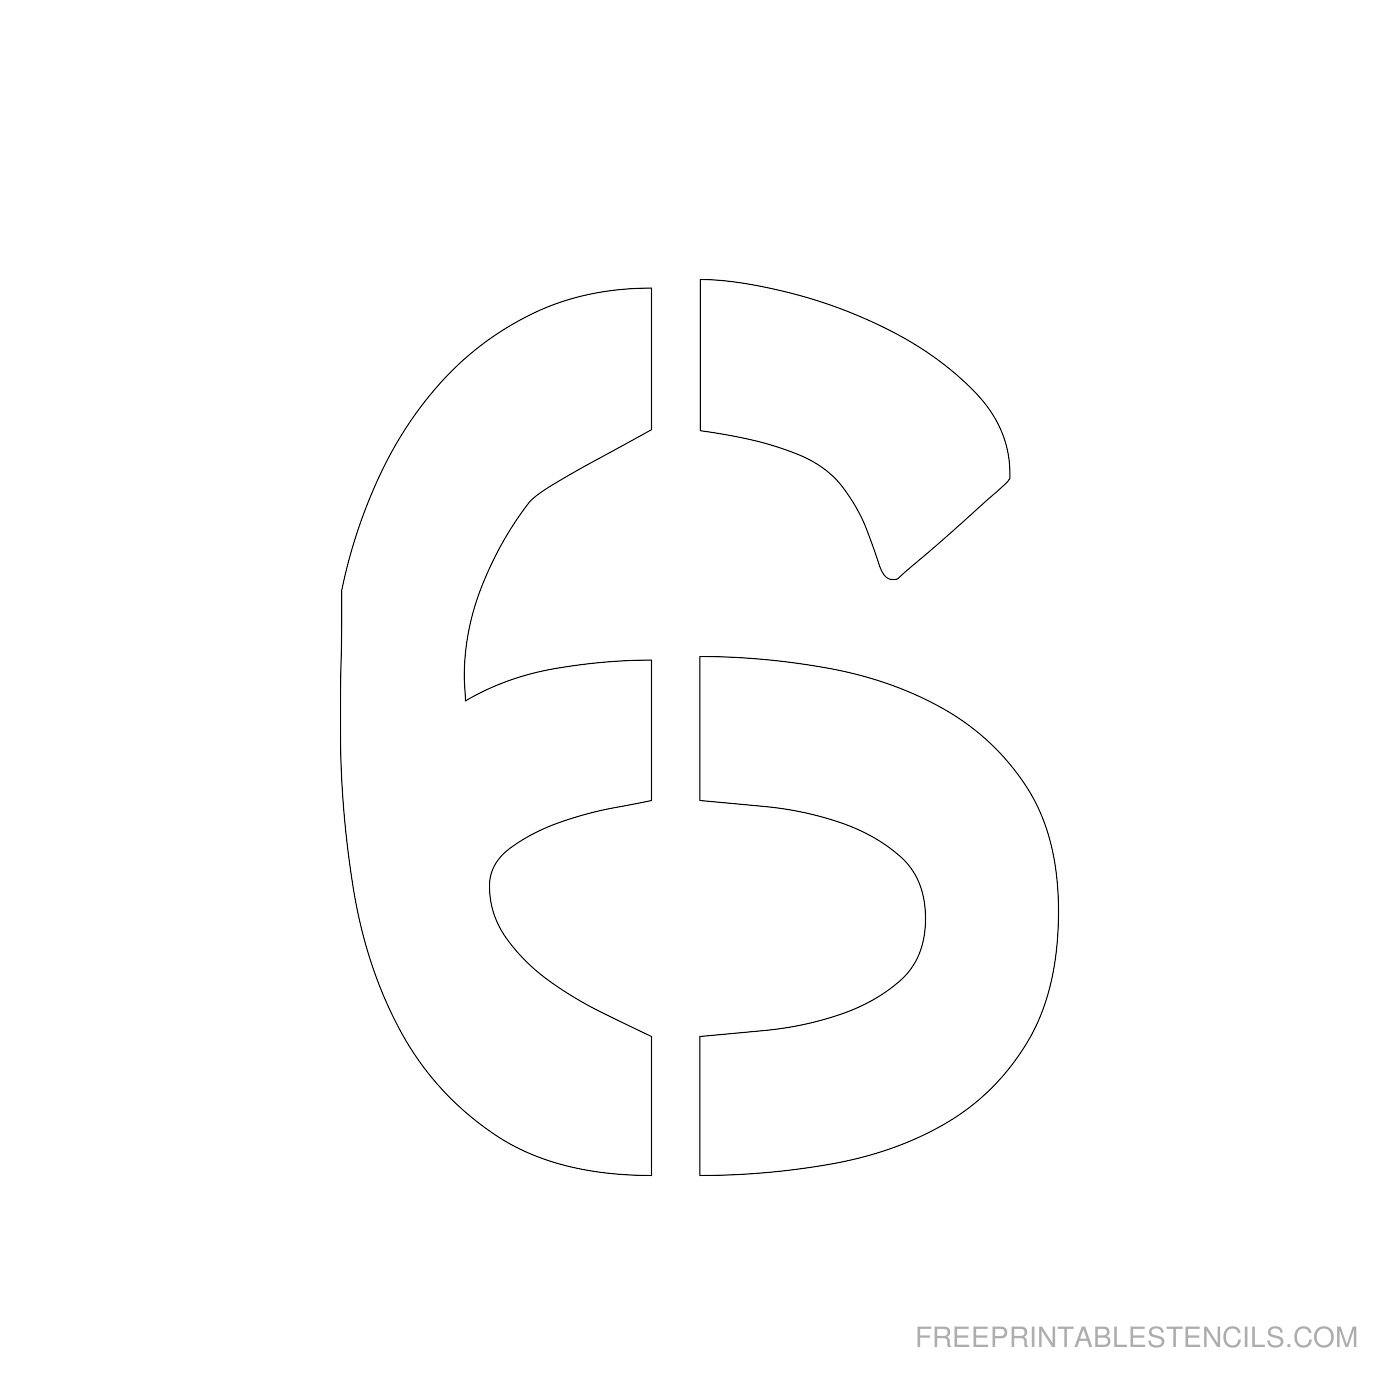 Printable 4 Inch Number Stencils 1-10 | Free Printable Stencils - Free Printable 4 Inch Number Stencils